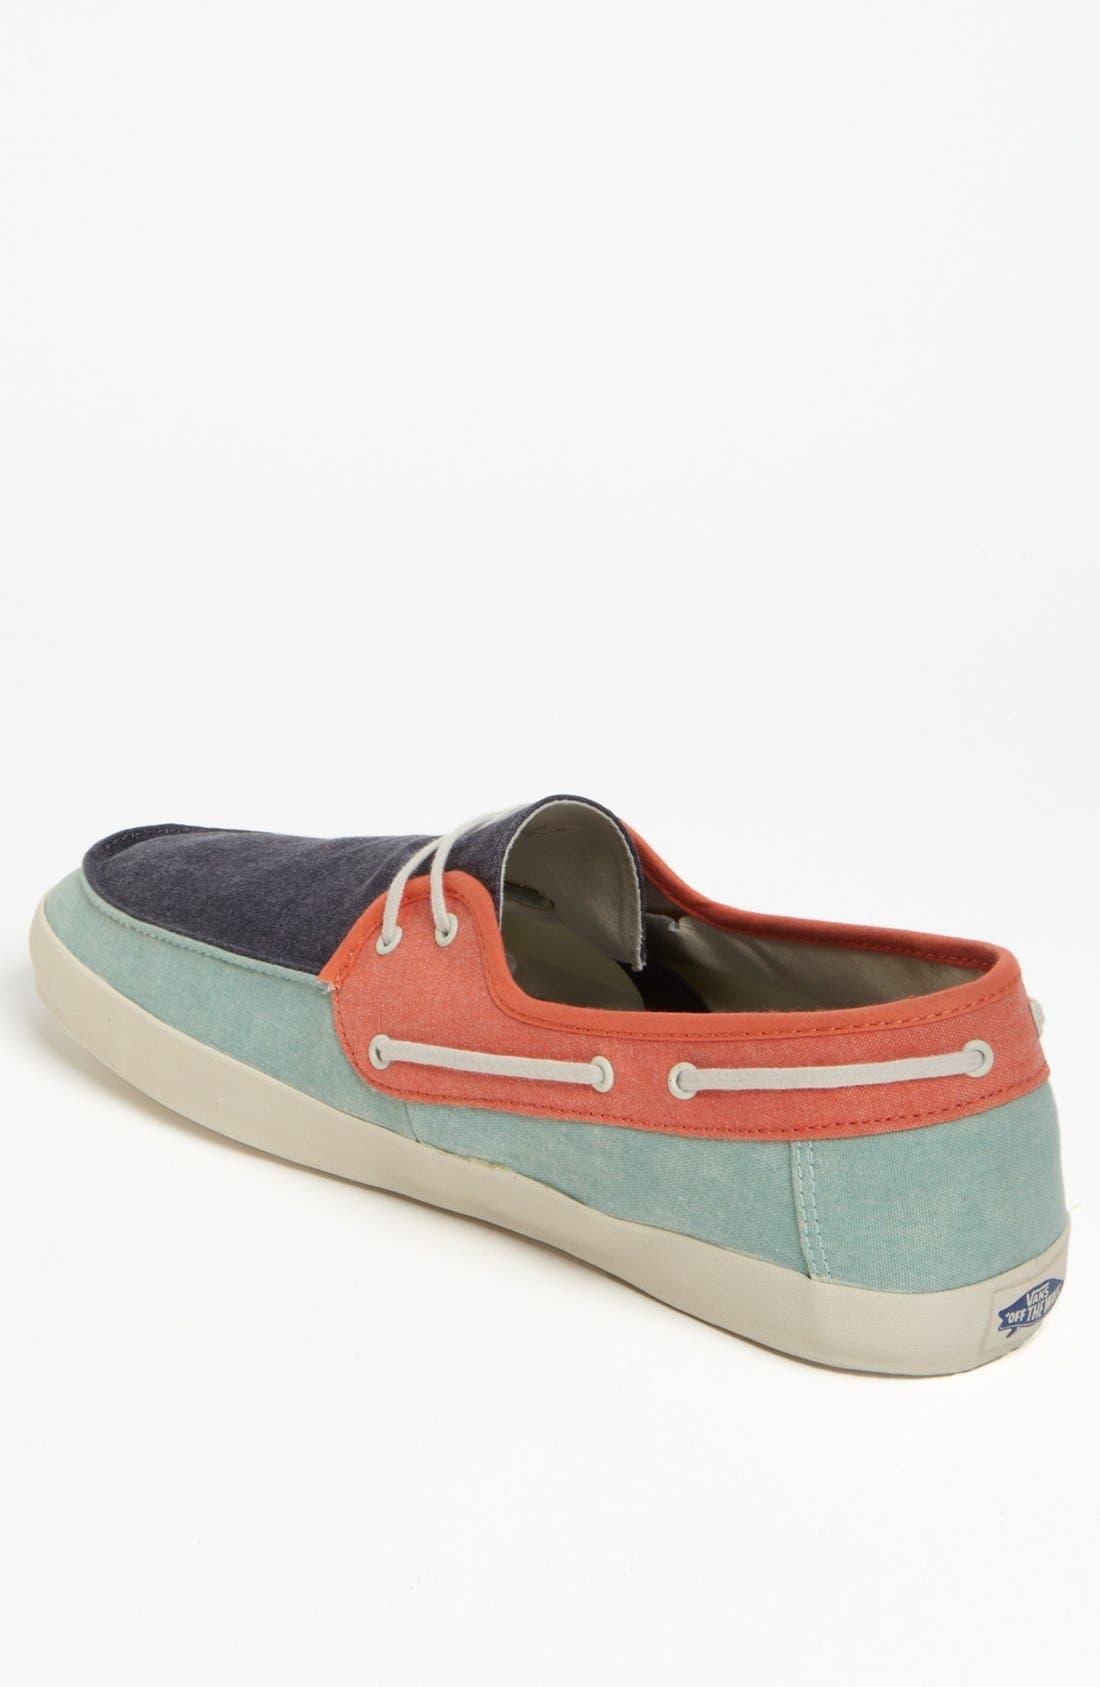 Alternate Image 2  - Vans 'Chauffeur' Boat Shoe (Men)